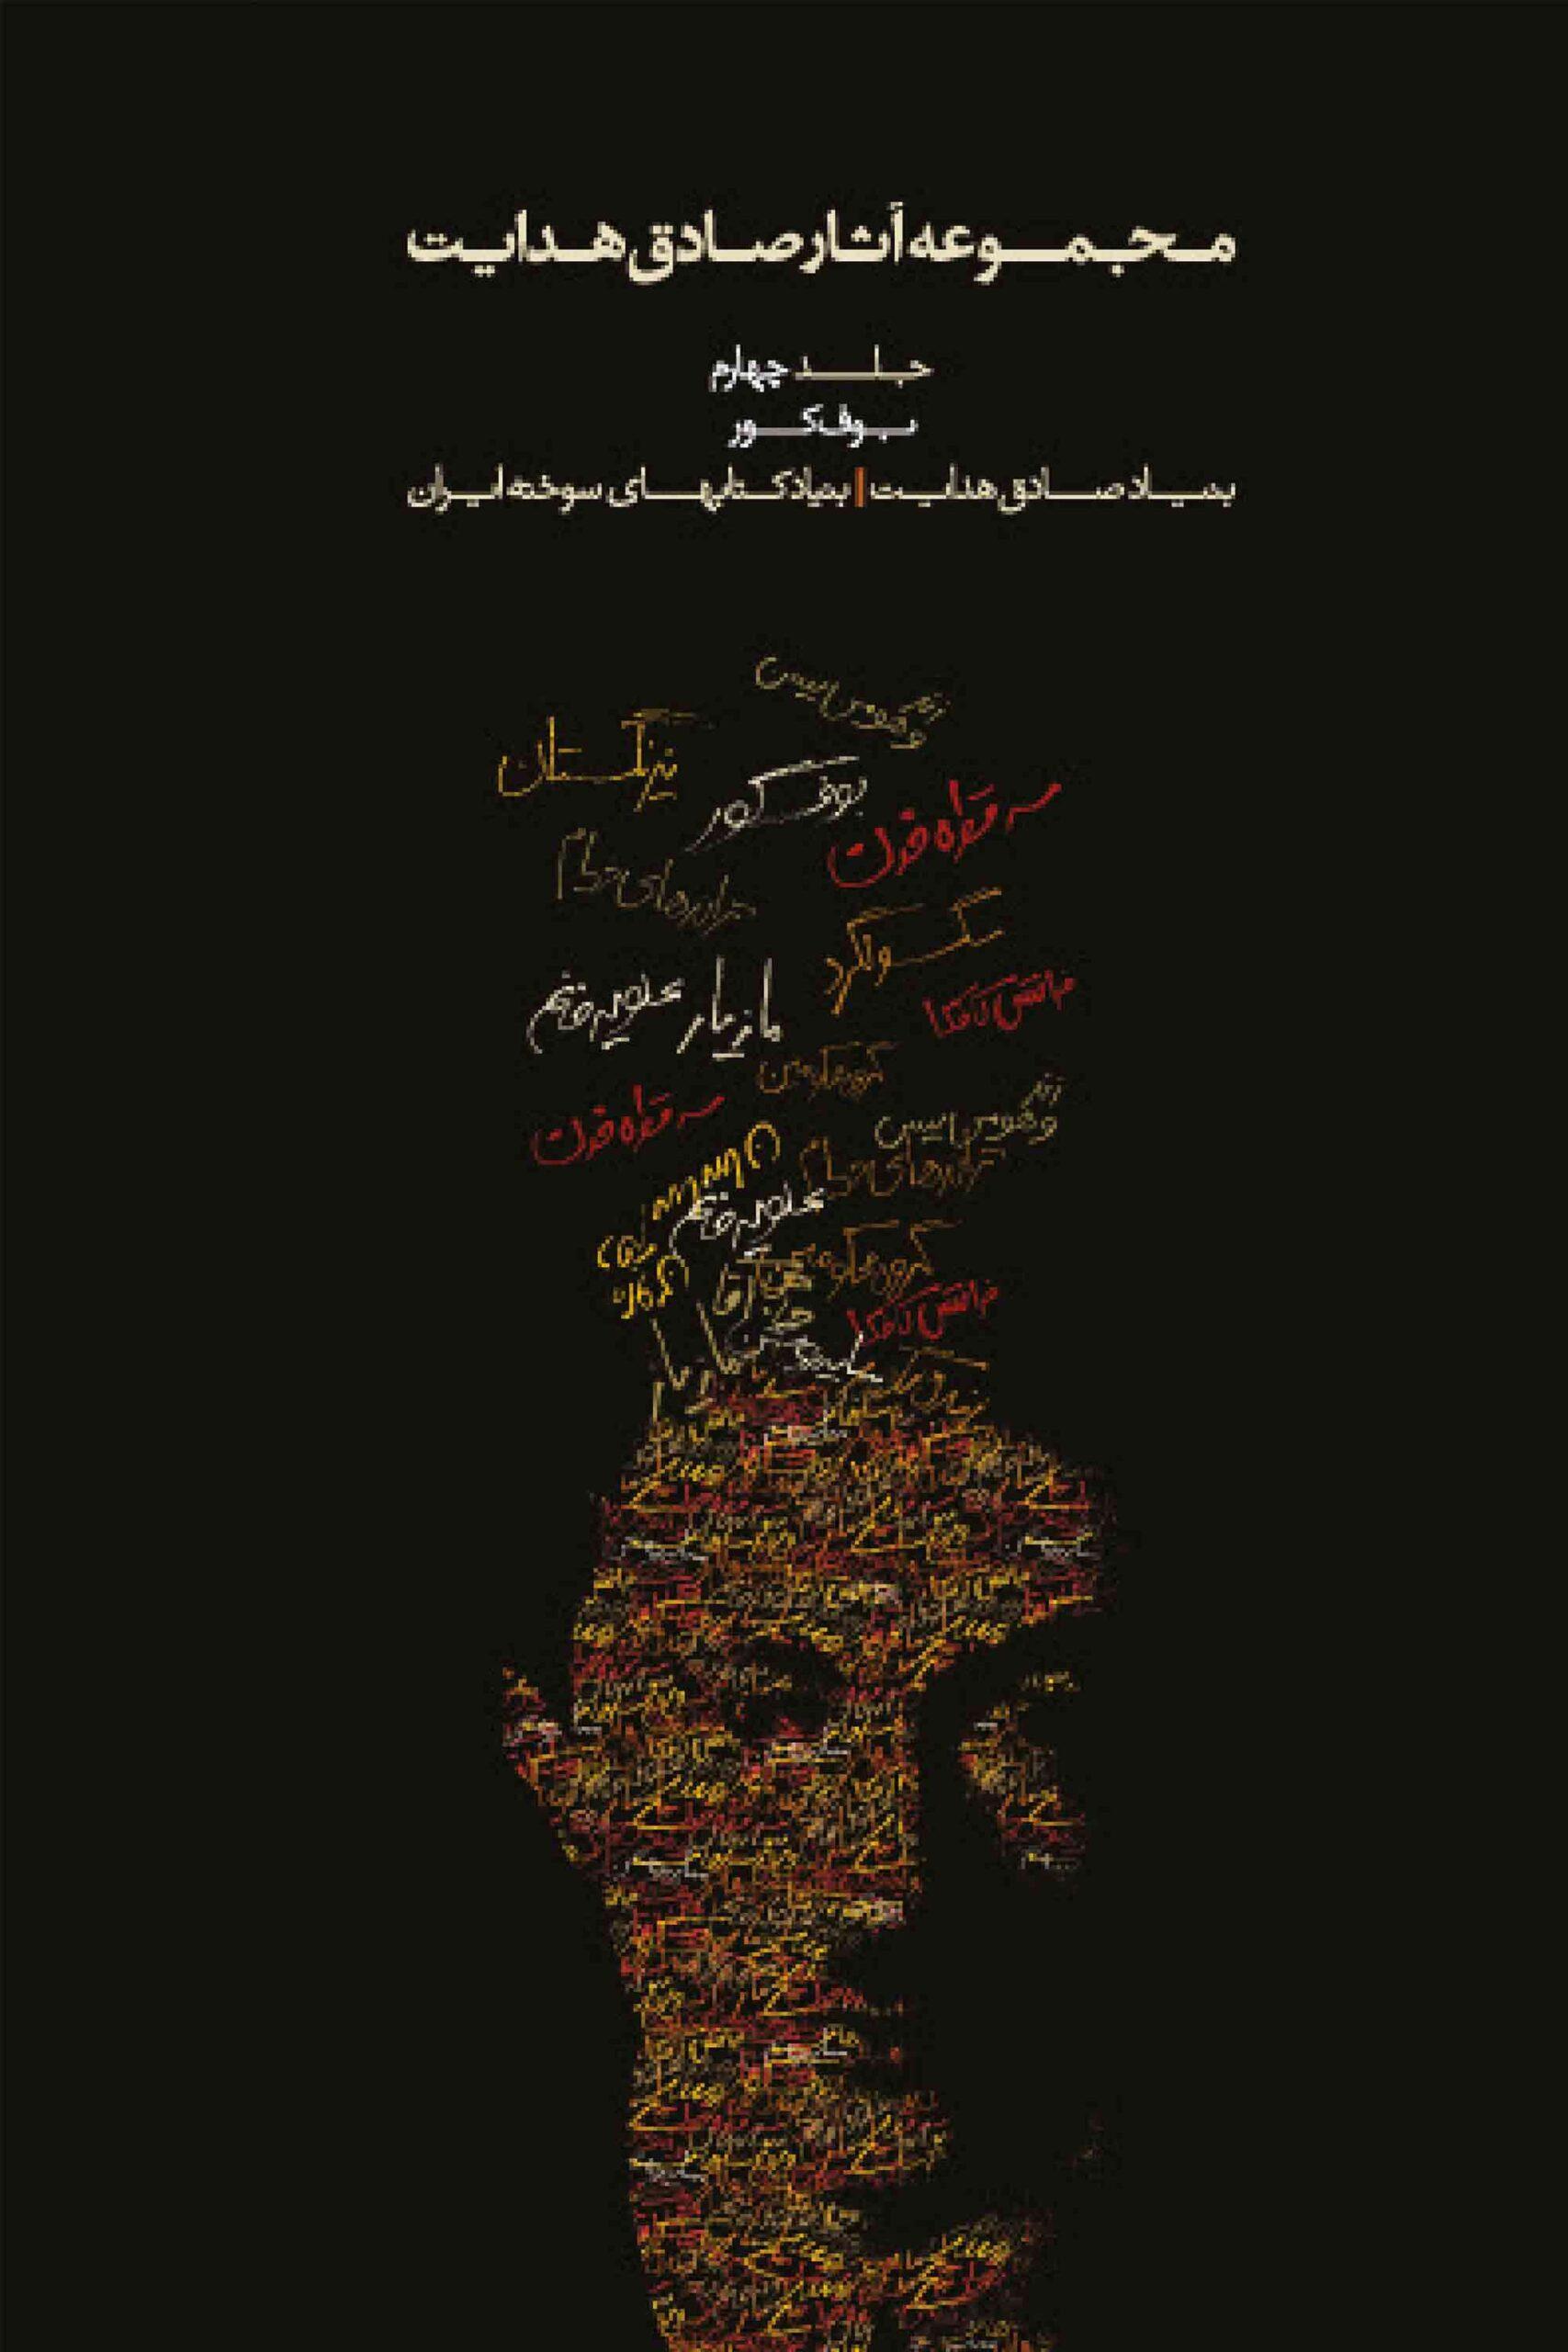 Sadegh Hedayat Vol. IV – Bufe Kur (the Blind Owl)